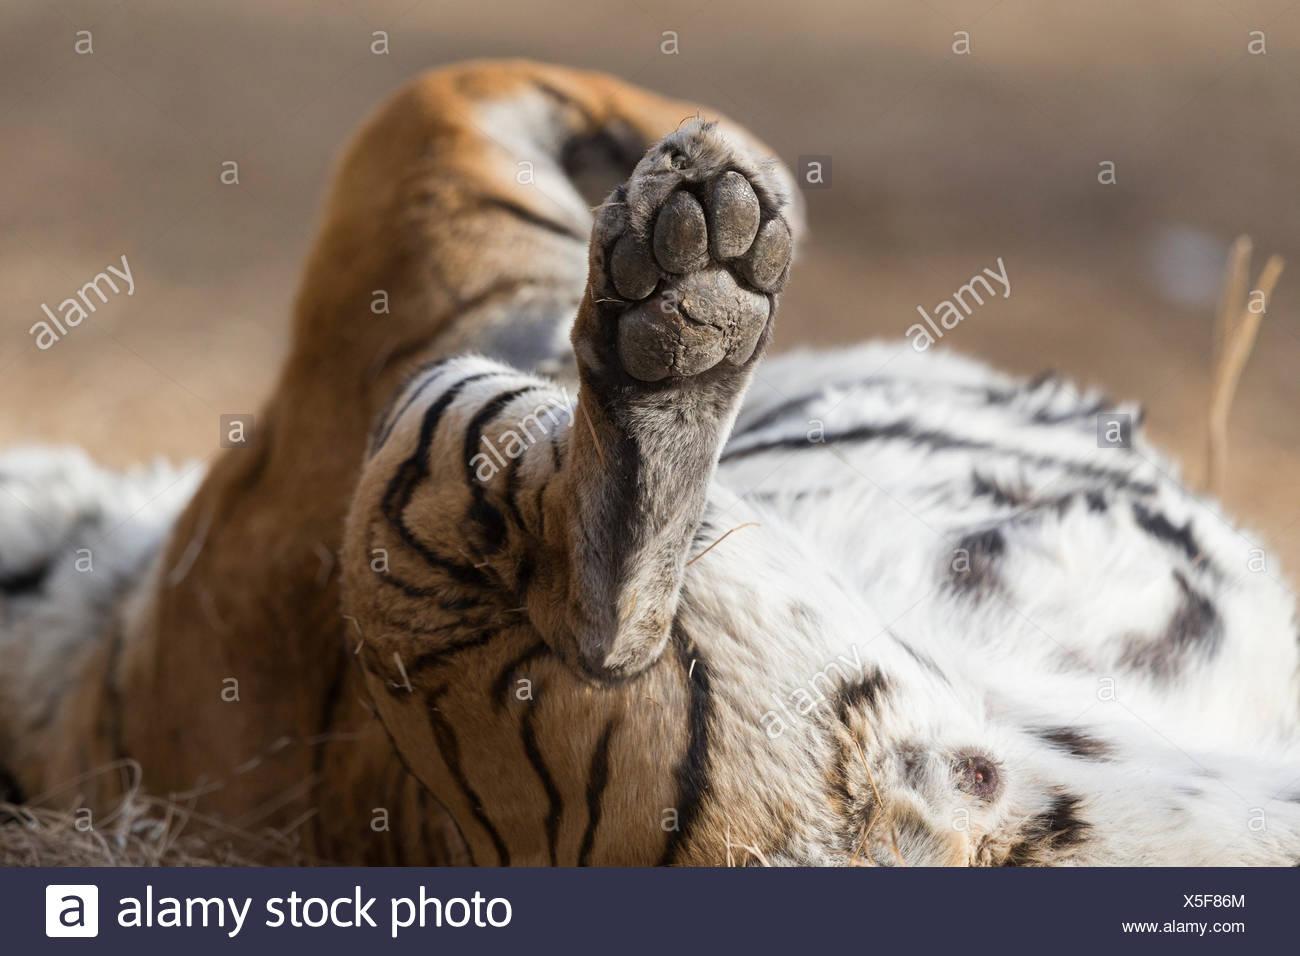 White Asian (Bengal) Tiger (Panthera tigris tigris),  hindlegs, paws, sole of foot visible - Stock Image